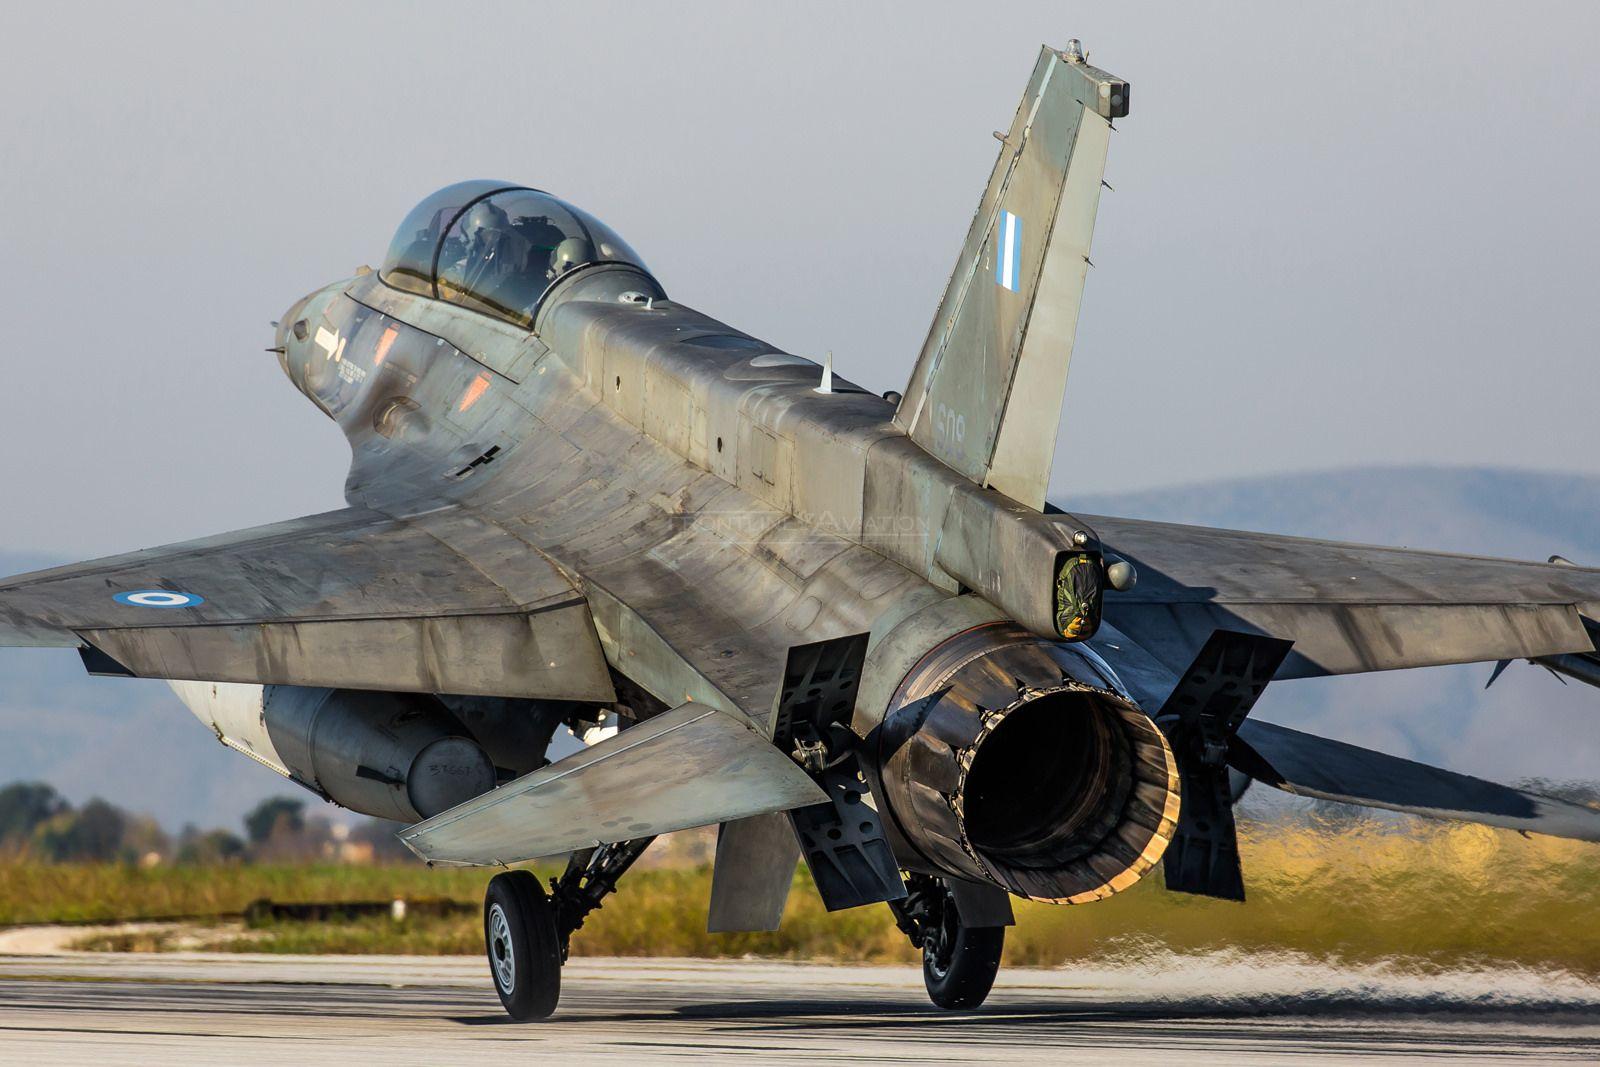 F16D, 'Ghost' 337 Sqn, 110CW F16 fighting falcon